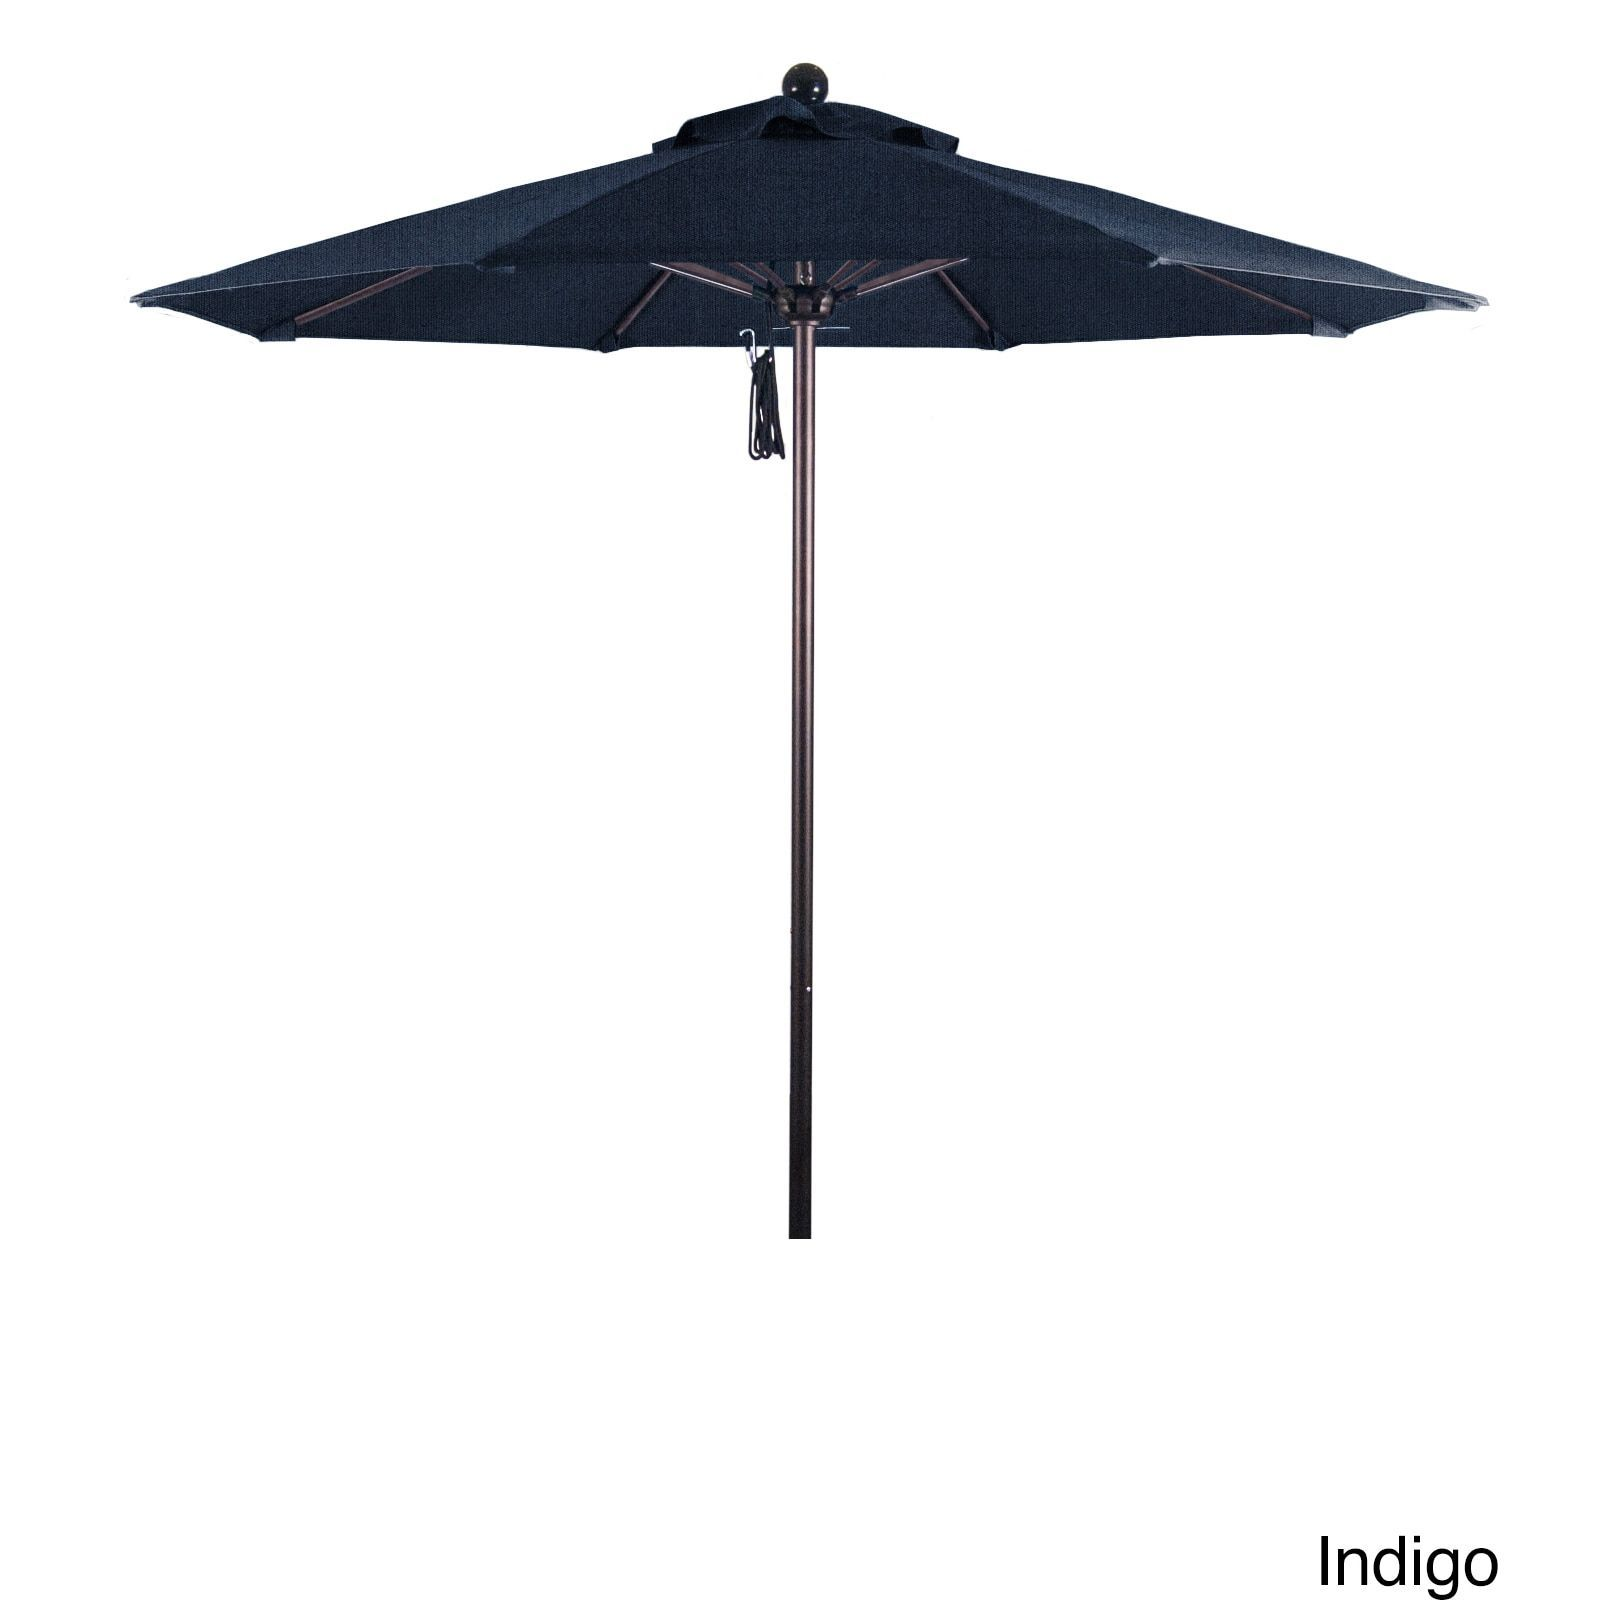 California Umbrella 7.5' Rd.. Frame, Fiberglass Rib Market Umbrella, Push Open, Bronze Finish, Sunbrella Fabric